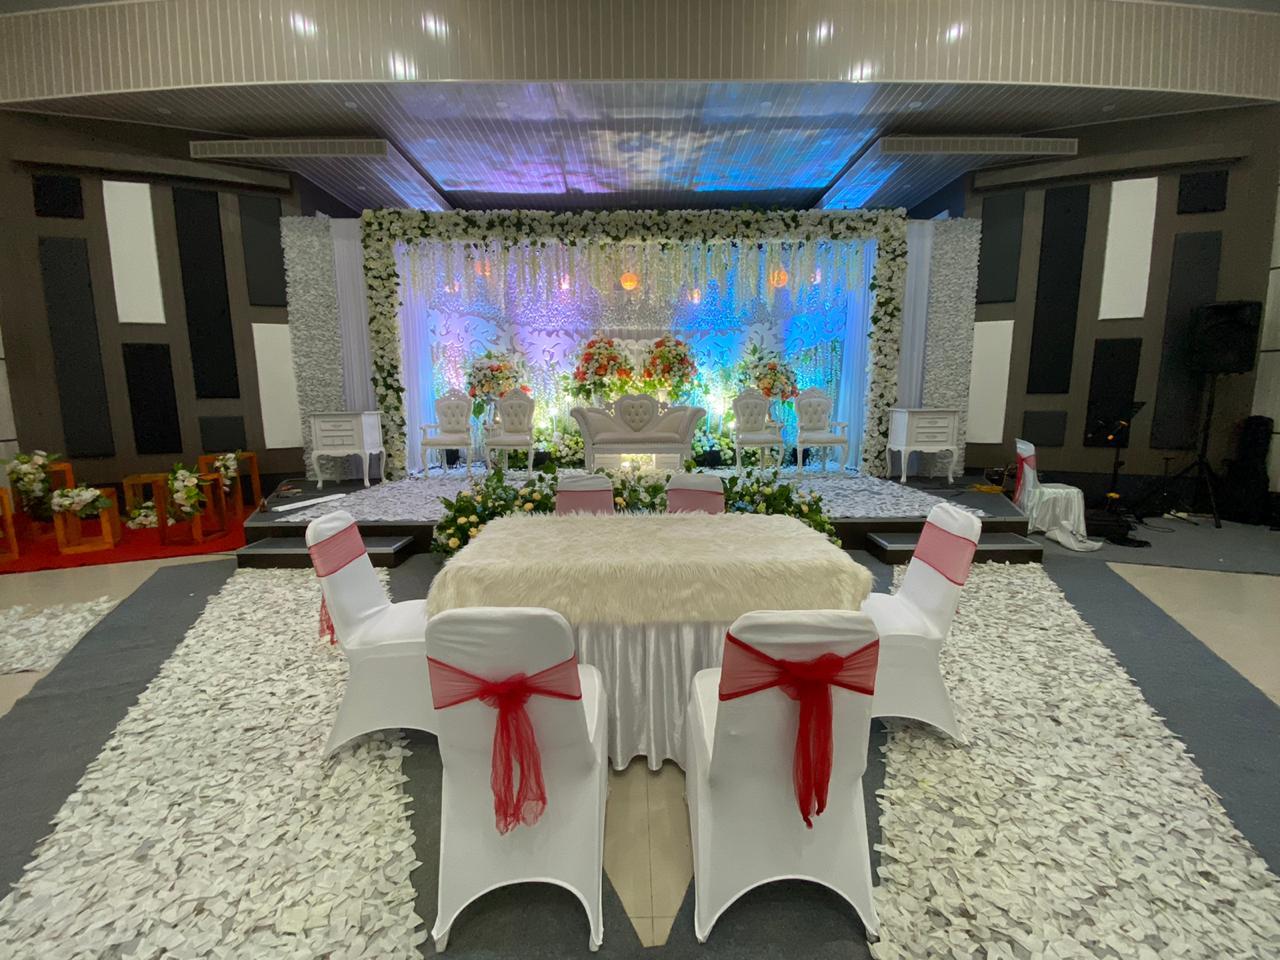 Paguntaka Ballroom Sumbang PNBP Sebesar Rp160 Juta